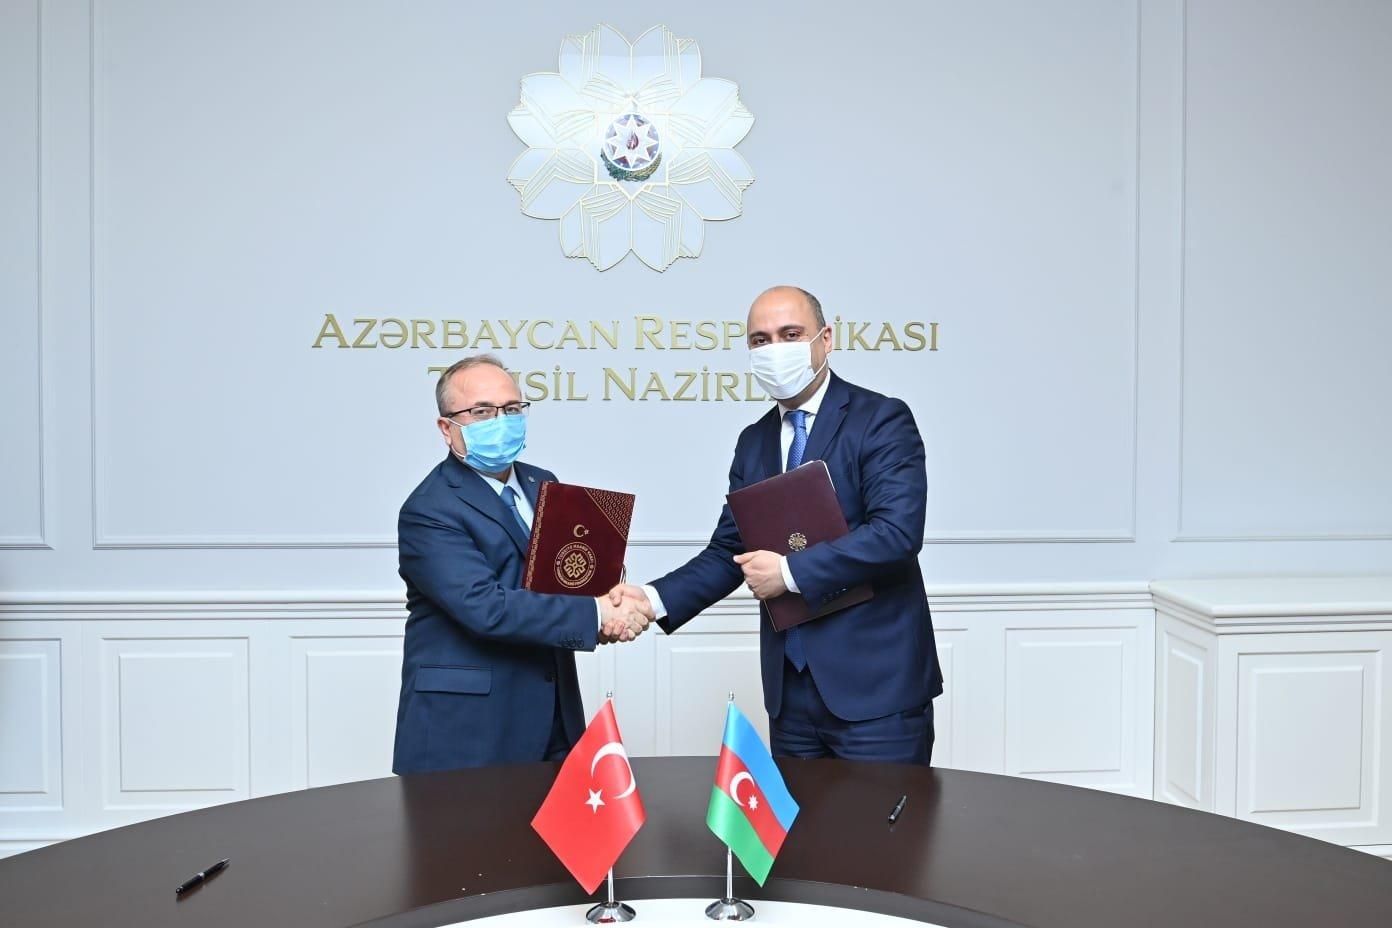 President of Maarif Foundation Birol Akgün (L) meets with Azerbaijan's Education Minister Emin Amrullayev in Baku, Azerbaijan, May 21, 2021. (AA Photo)